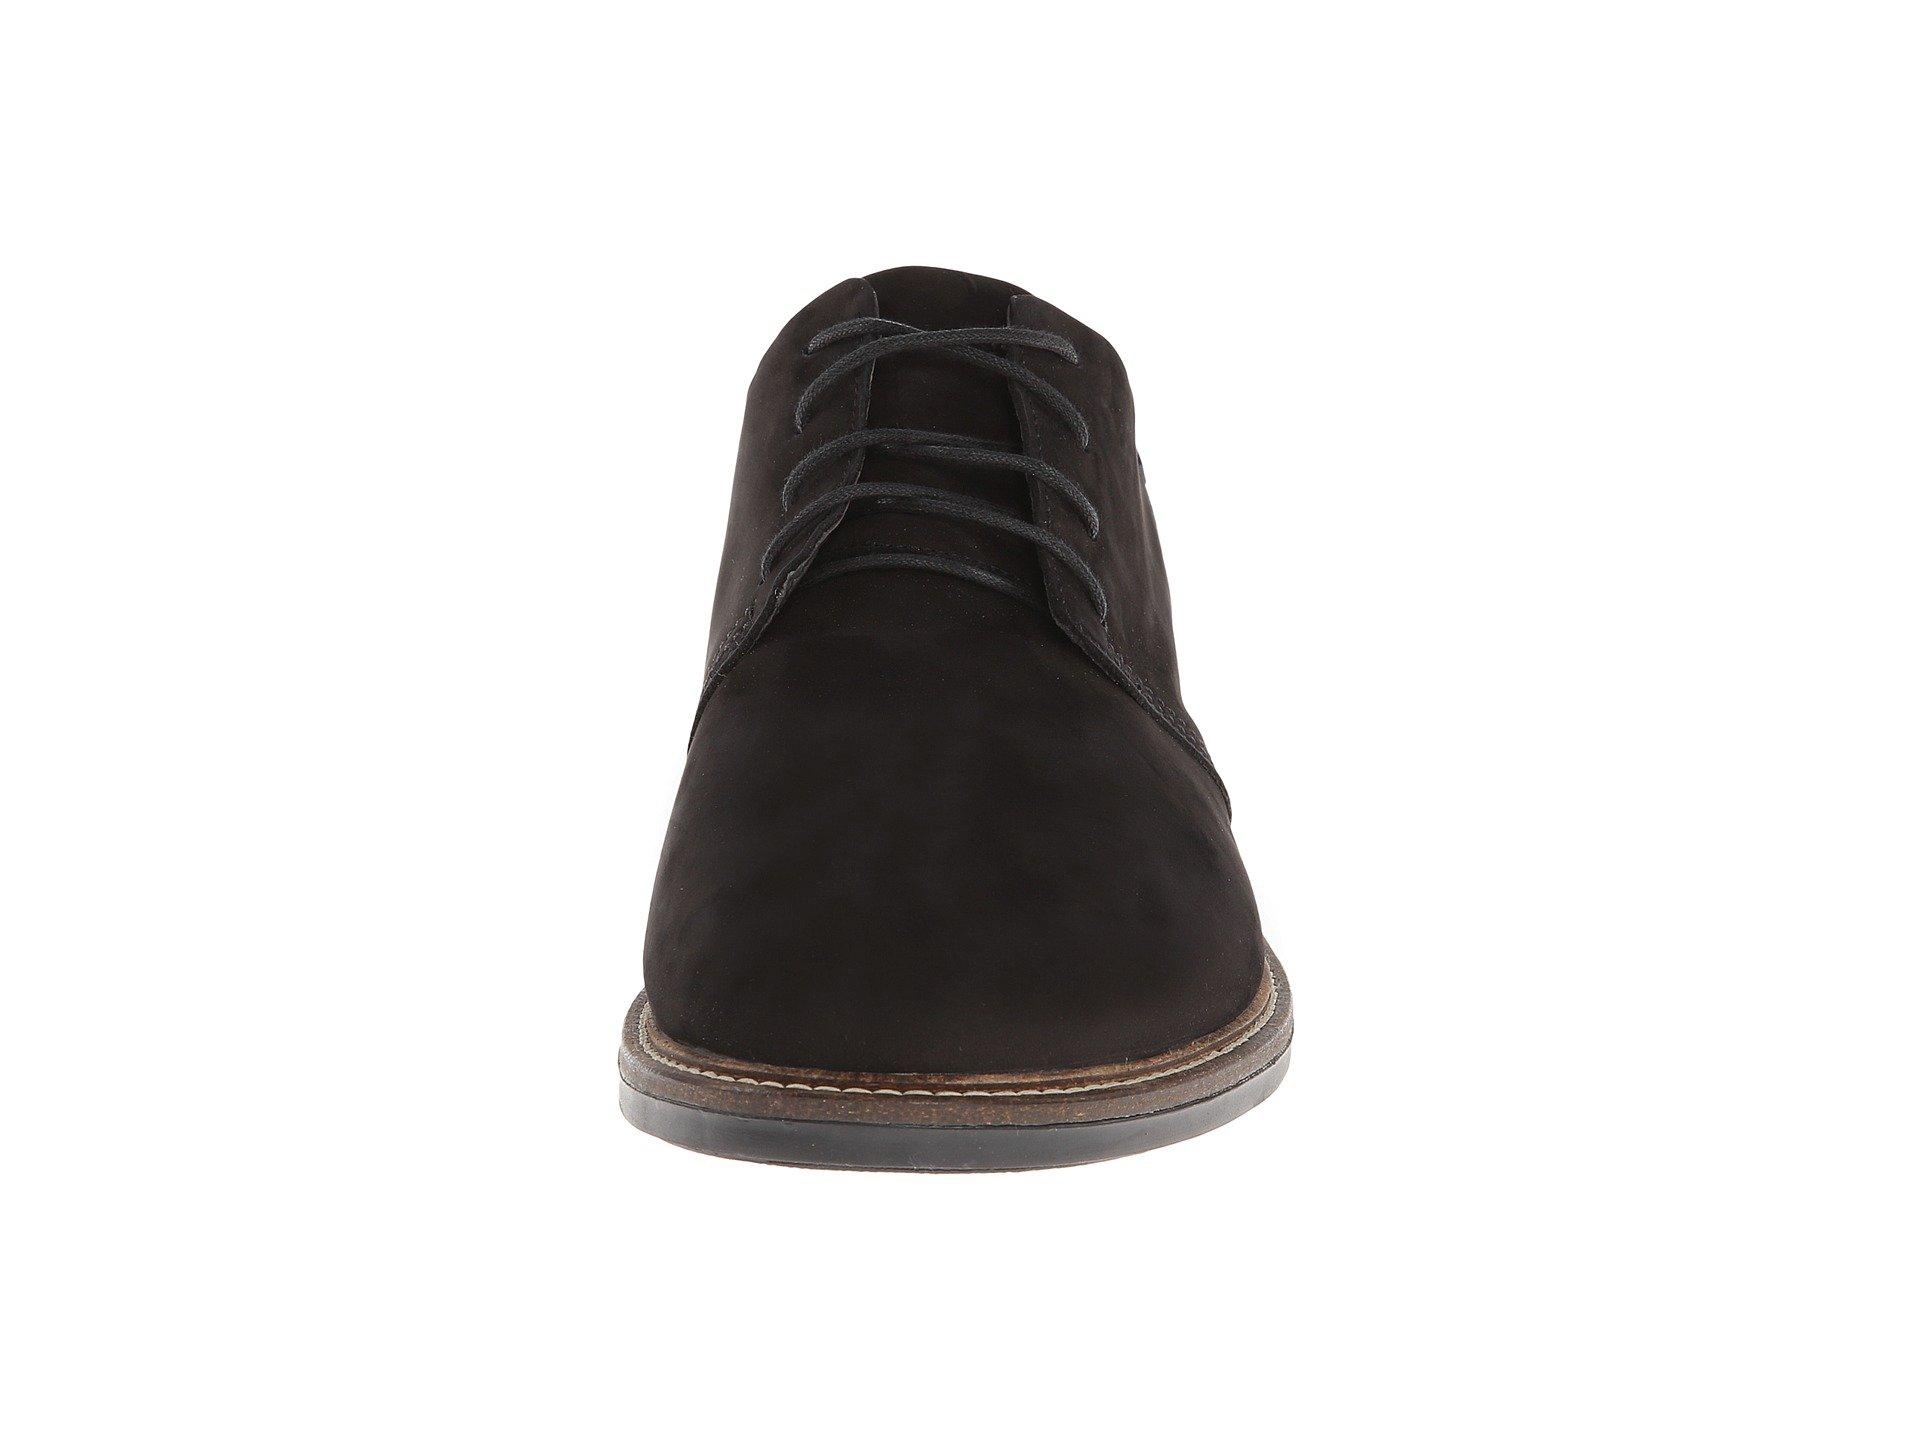 Chief black Naot onyx Leather Velvet Nubuck Black Raven Leather fvd1qd